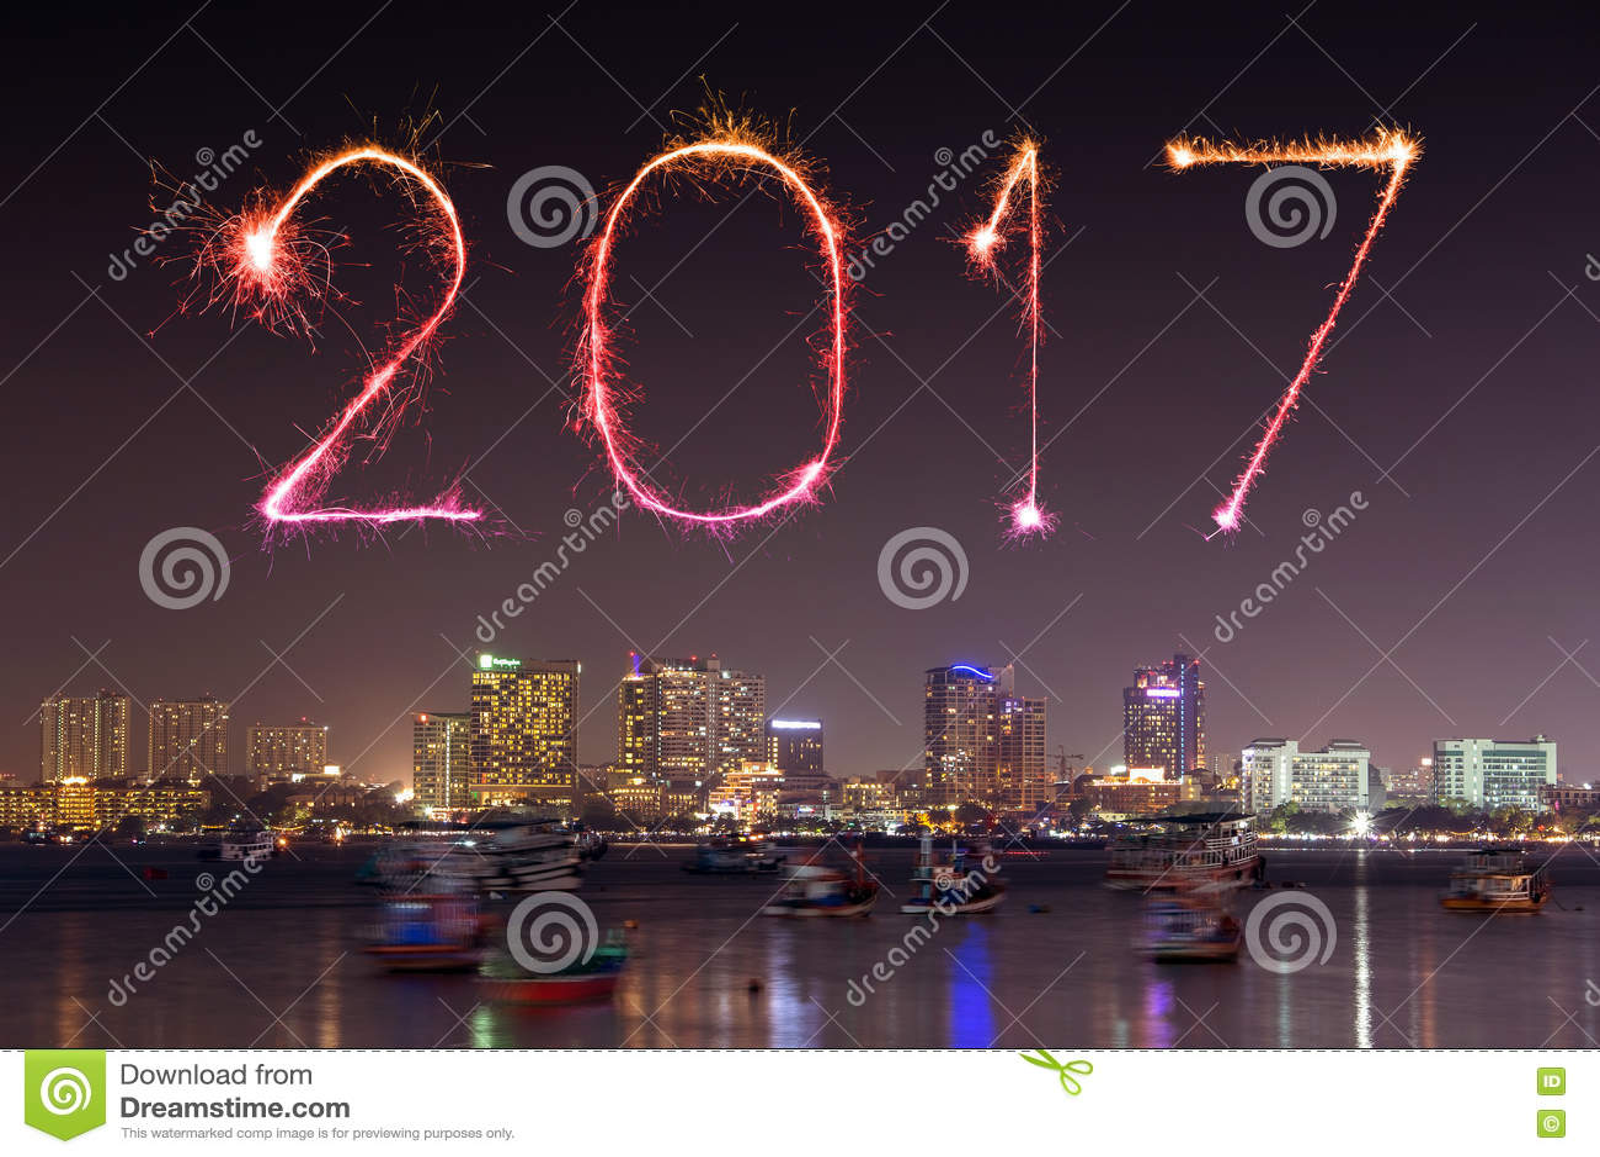 2017 happy new year fireworks celebrating over pattaya beach at night thailand